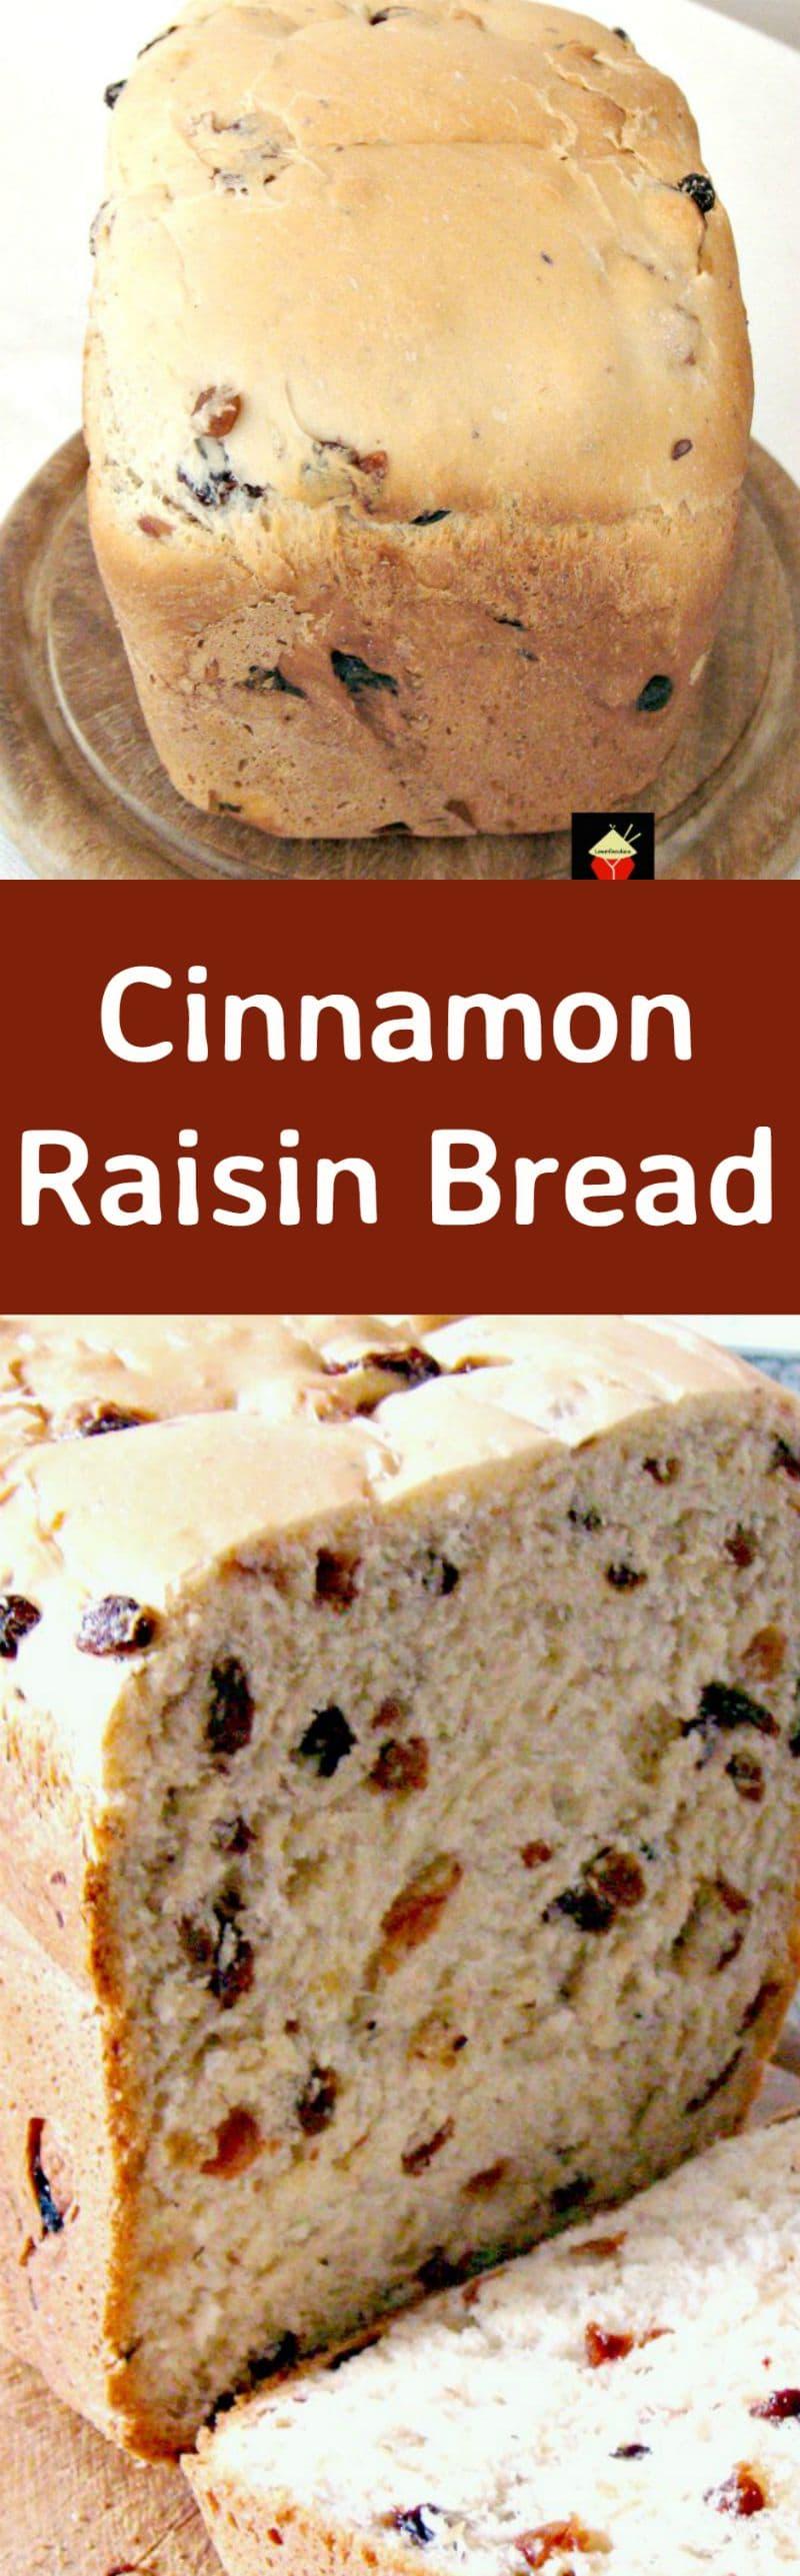 Cinnamon Raisin Bread A Nice Easy Bread To Make Using